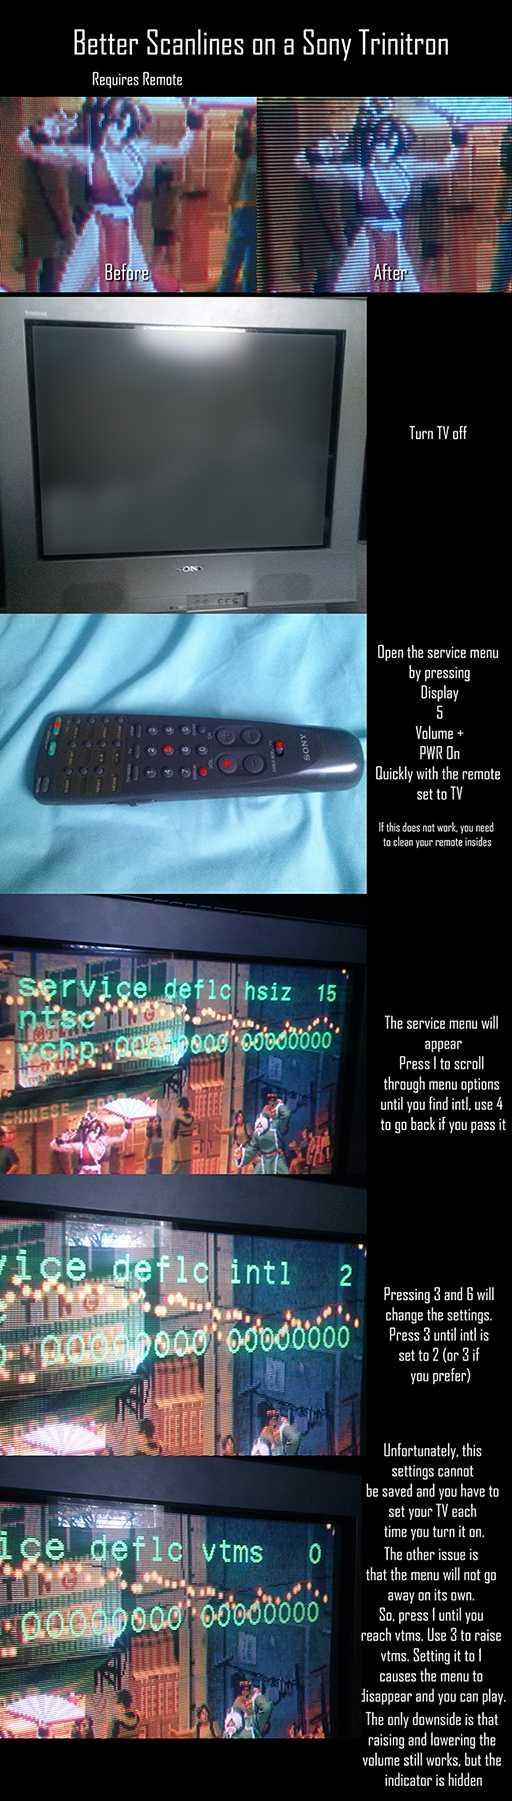 Analogue Mega SG - Page 7 09ee4a10